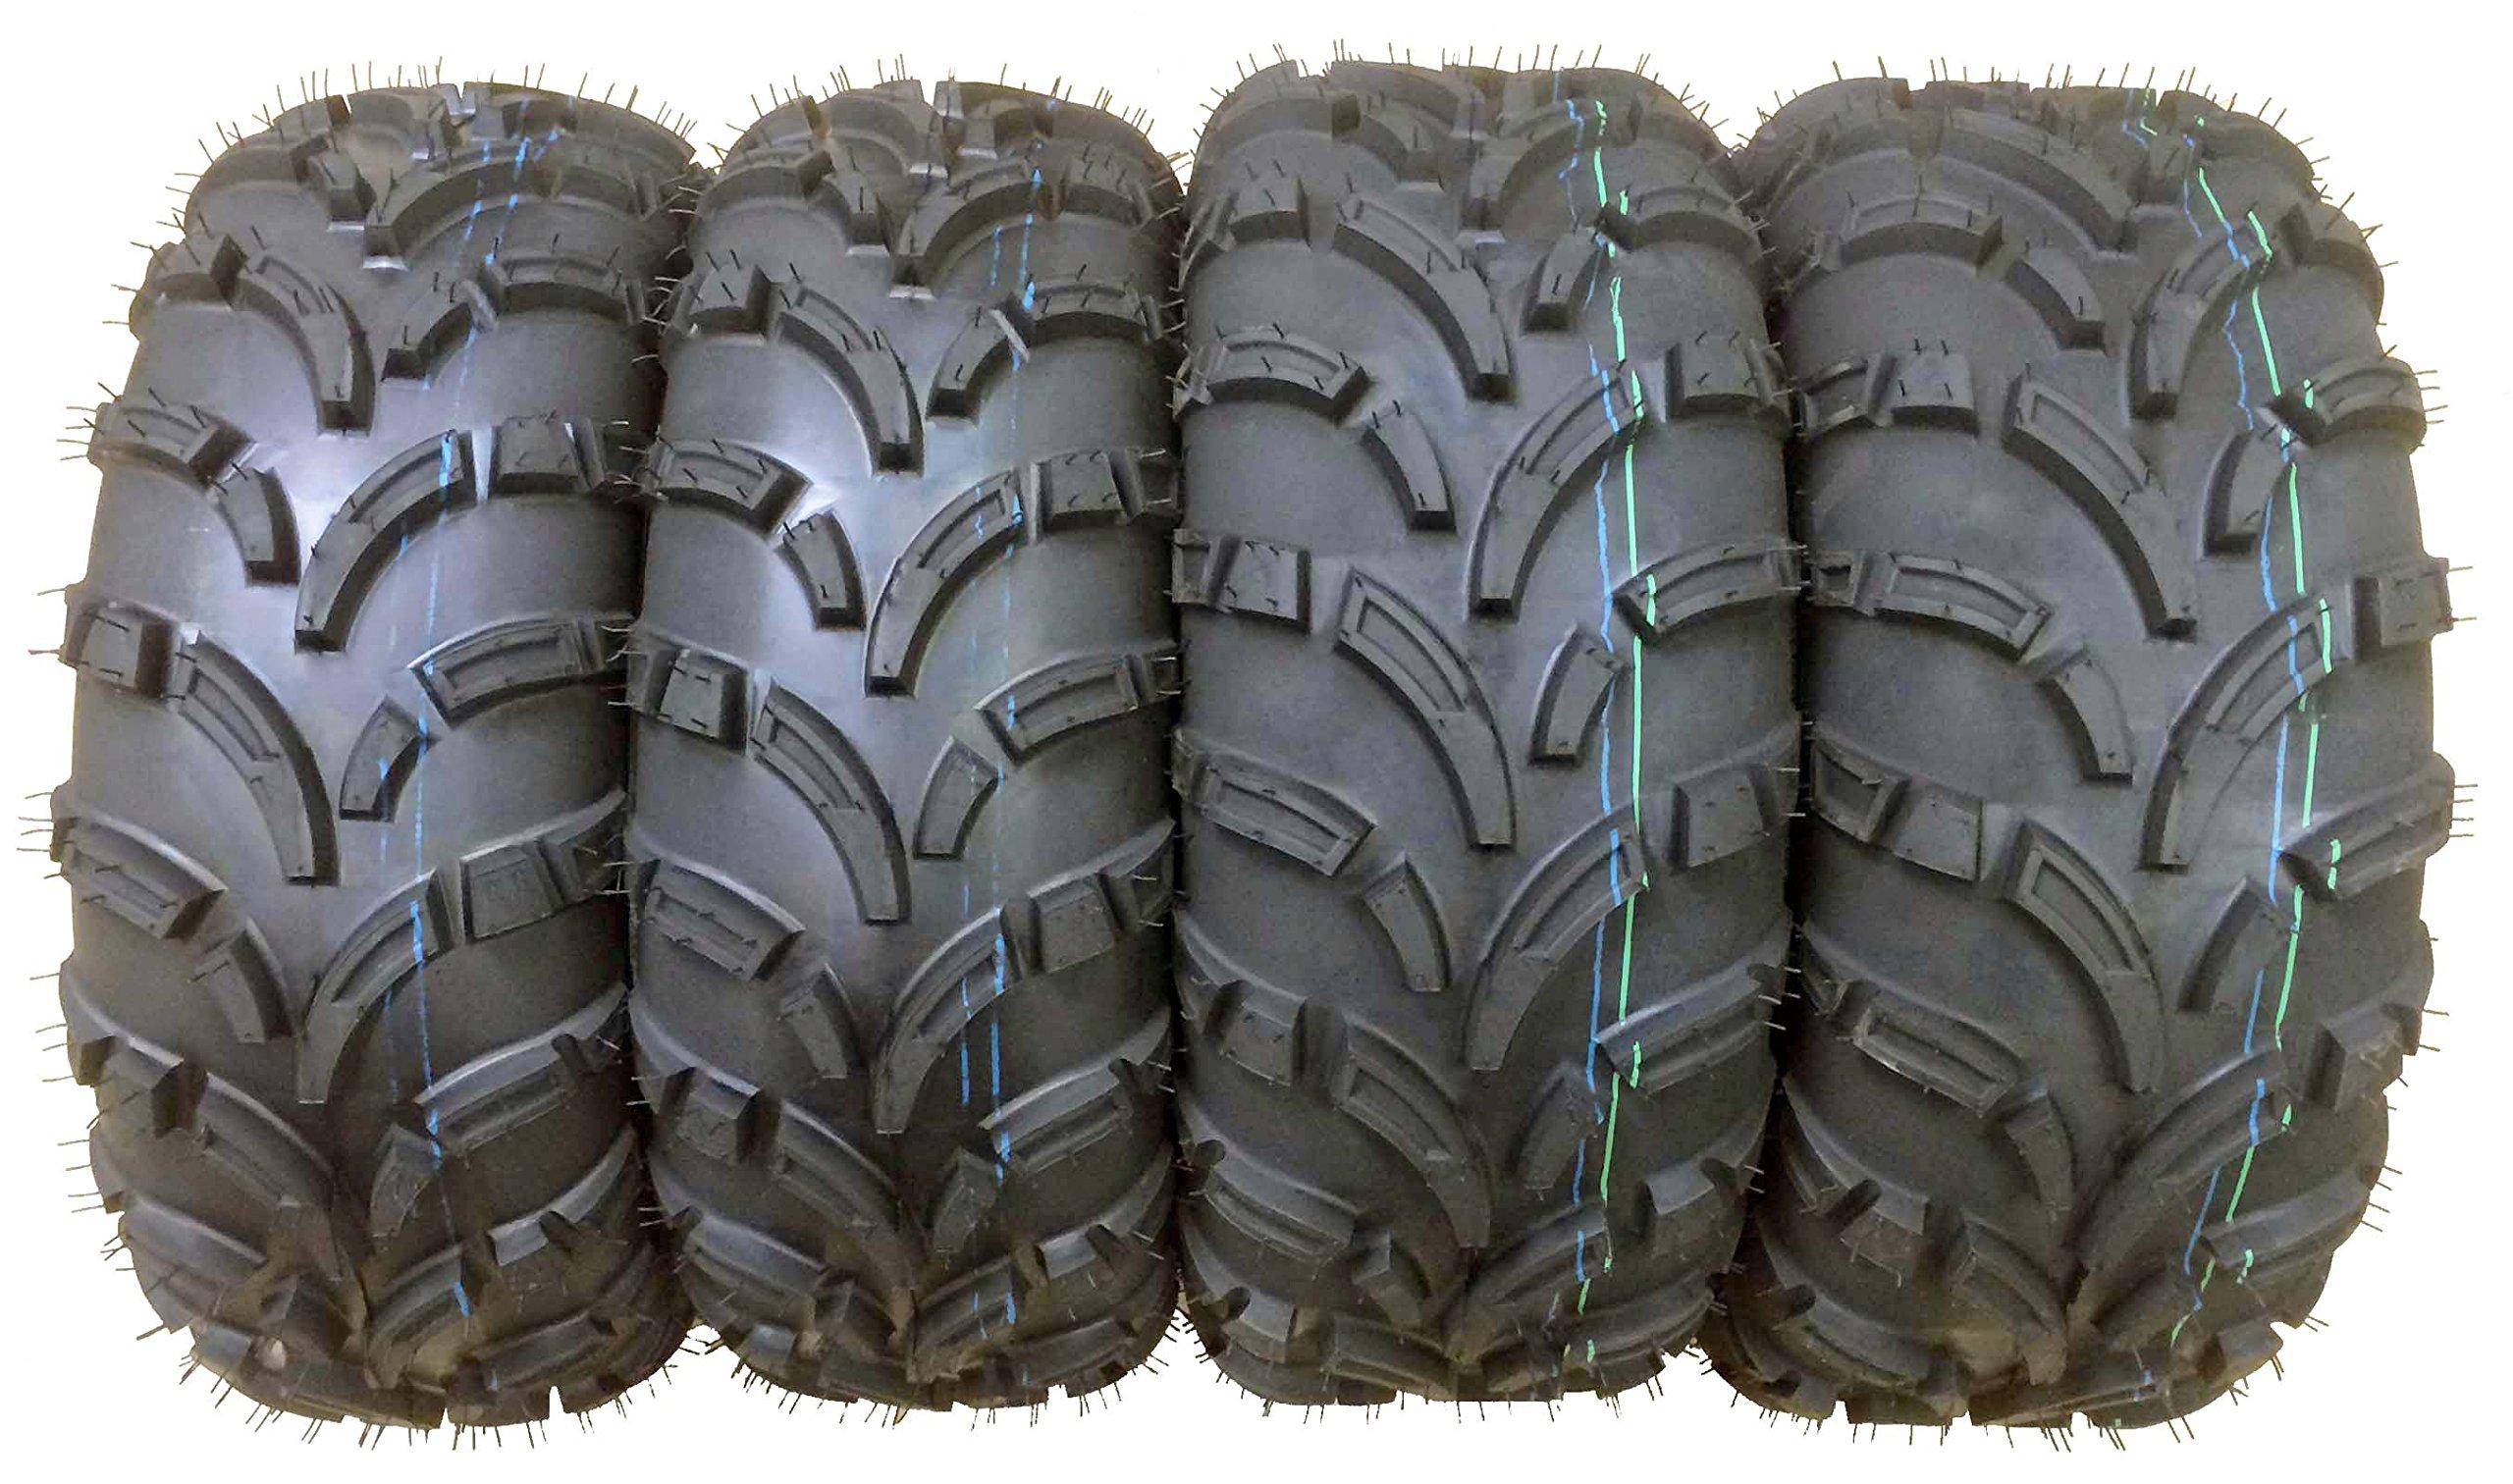 Set of 4 New WANDA ATV/UTV Tires 25x10-12 Front & 25x11-12 Rear /6PR P373